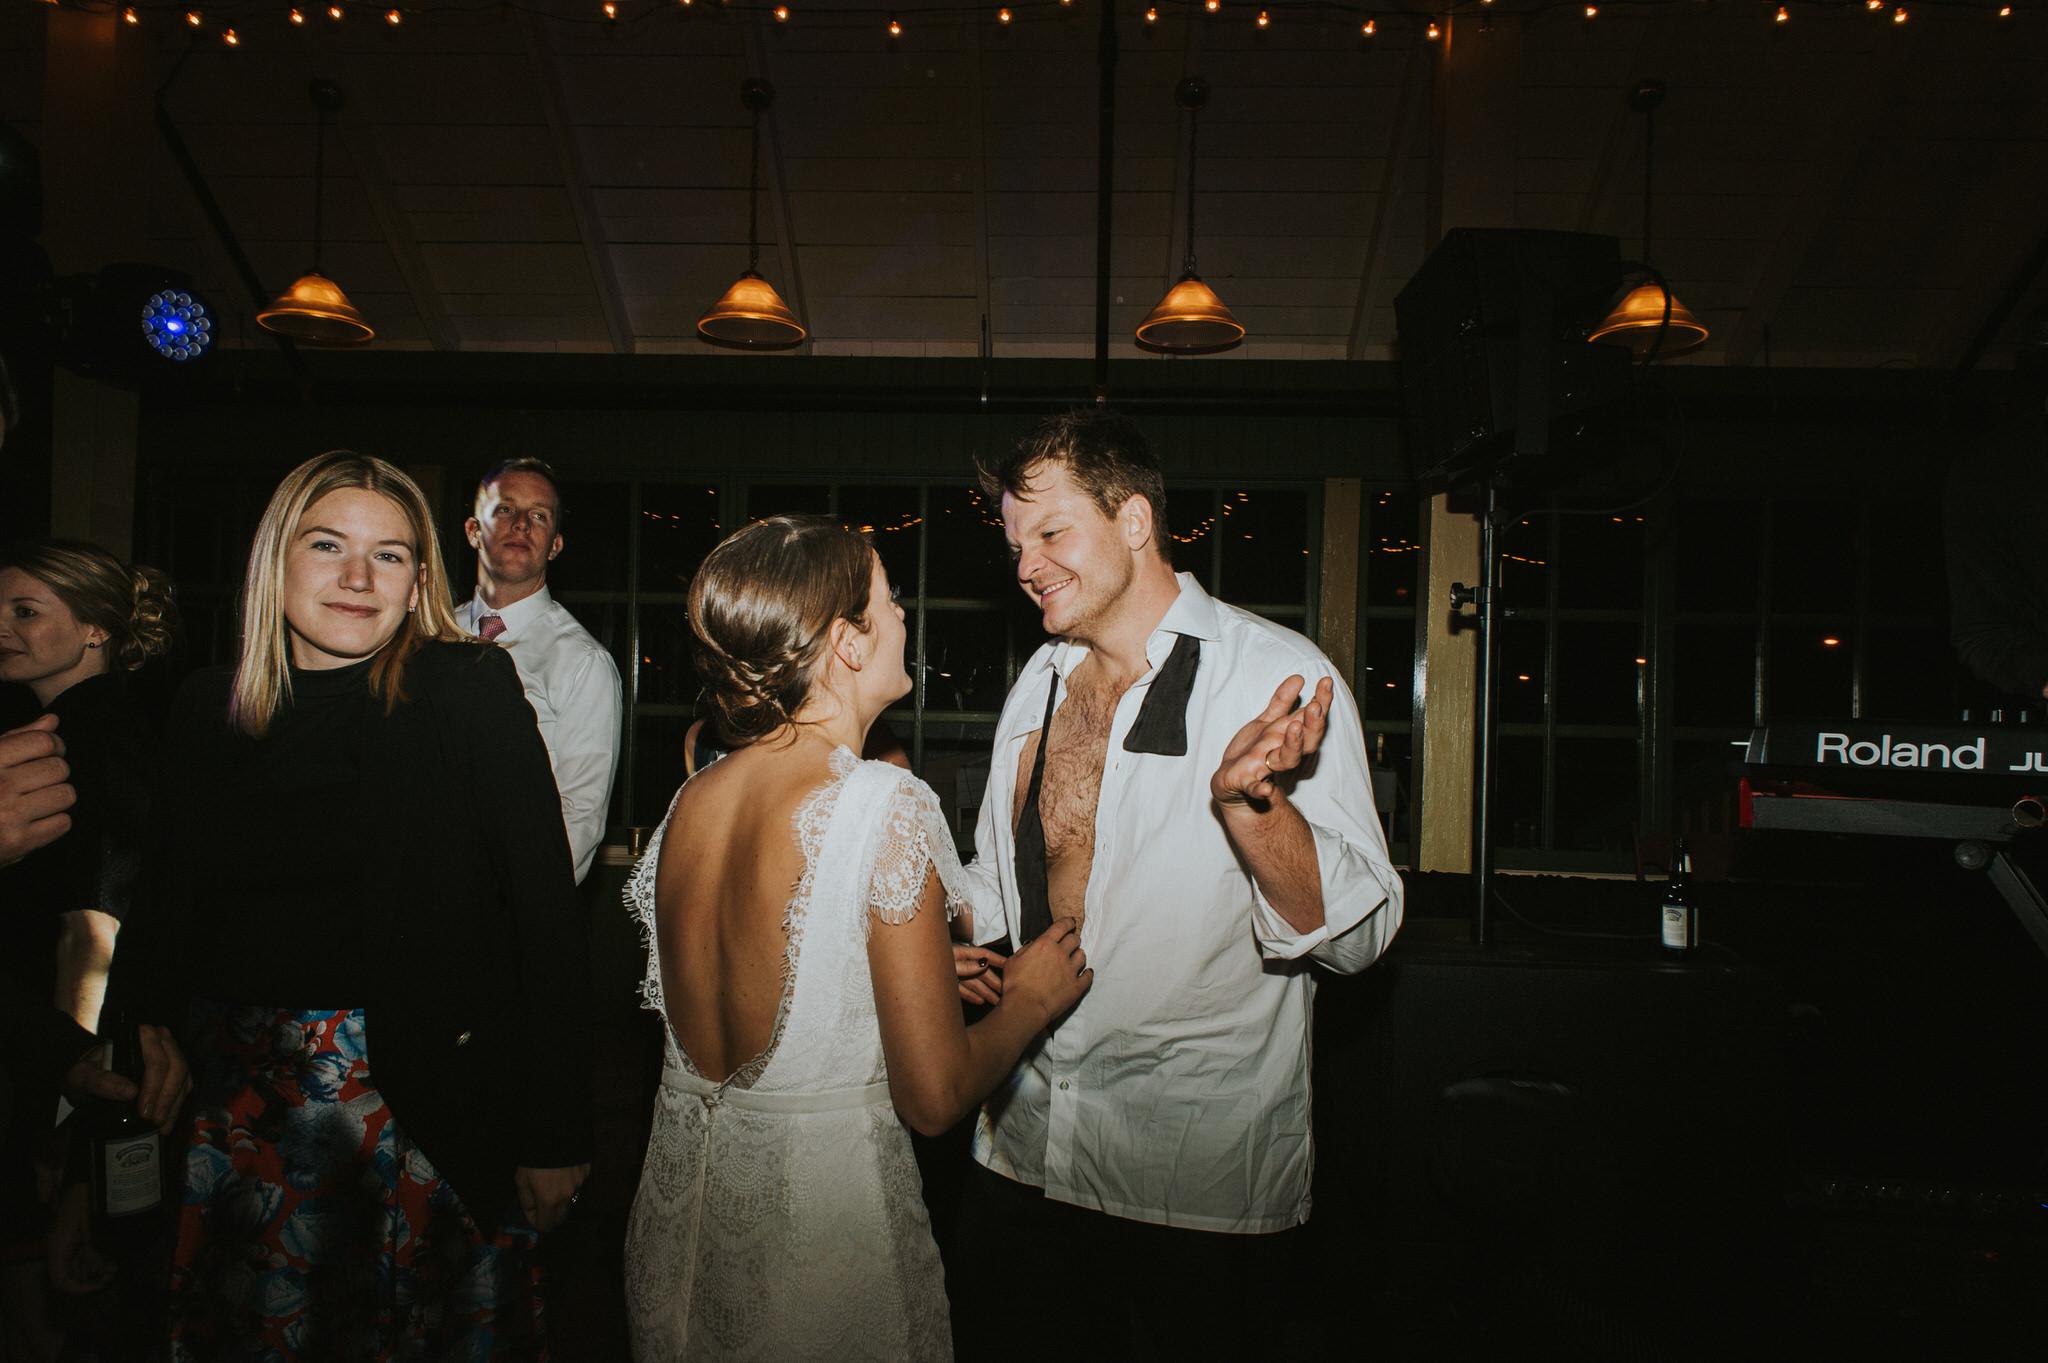 scarletoneillphotography_weddingphotography_prince edward county weddings230.JPG